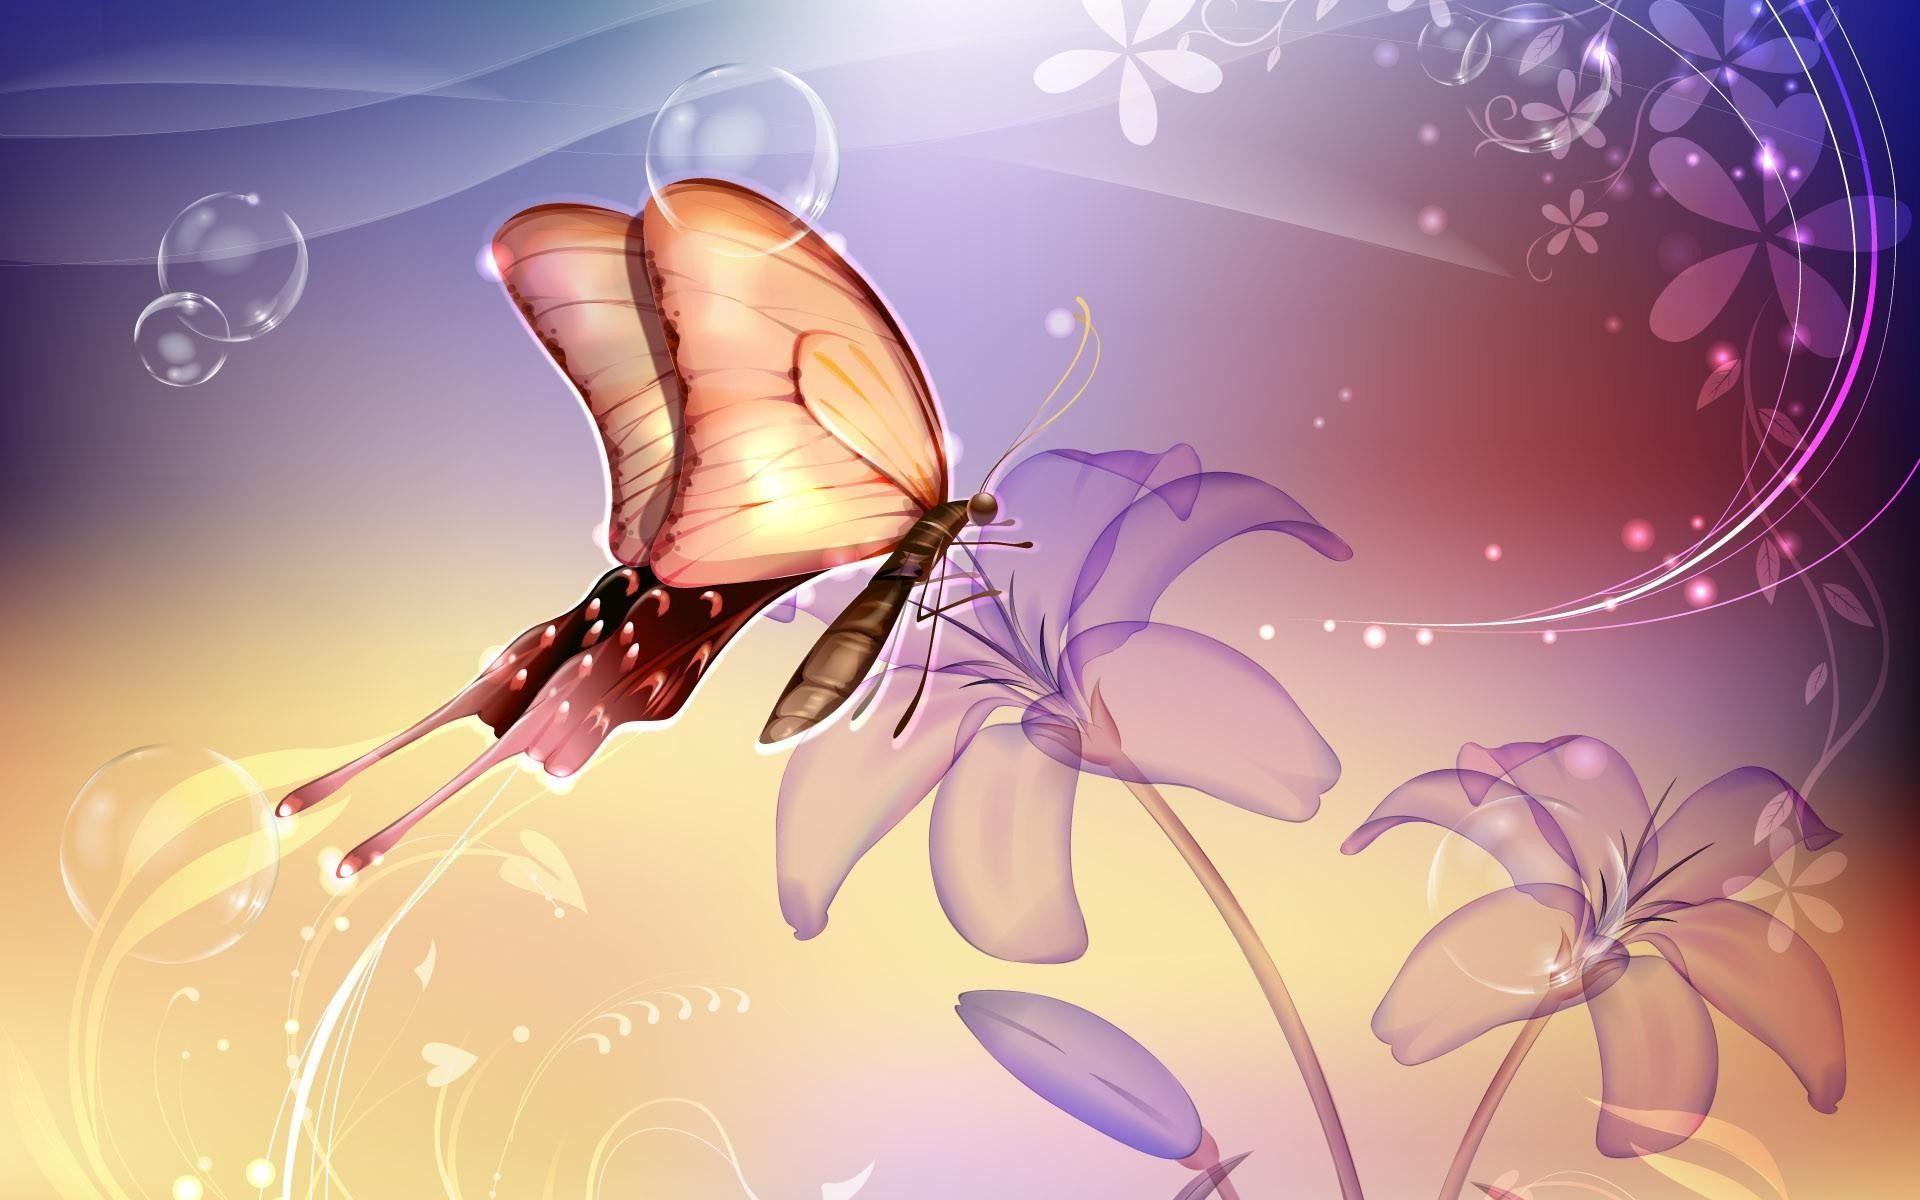 butterfly wallpapers hd wallpaper background